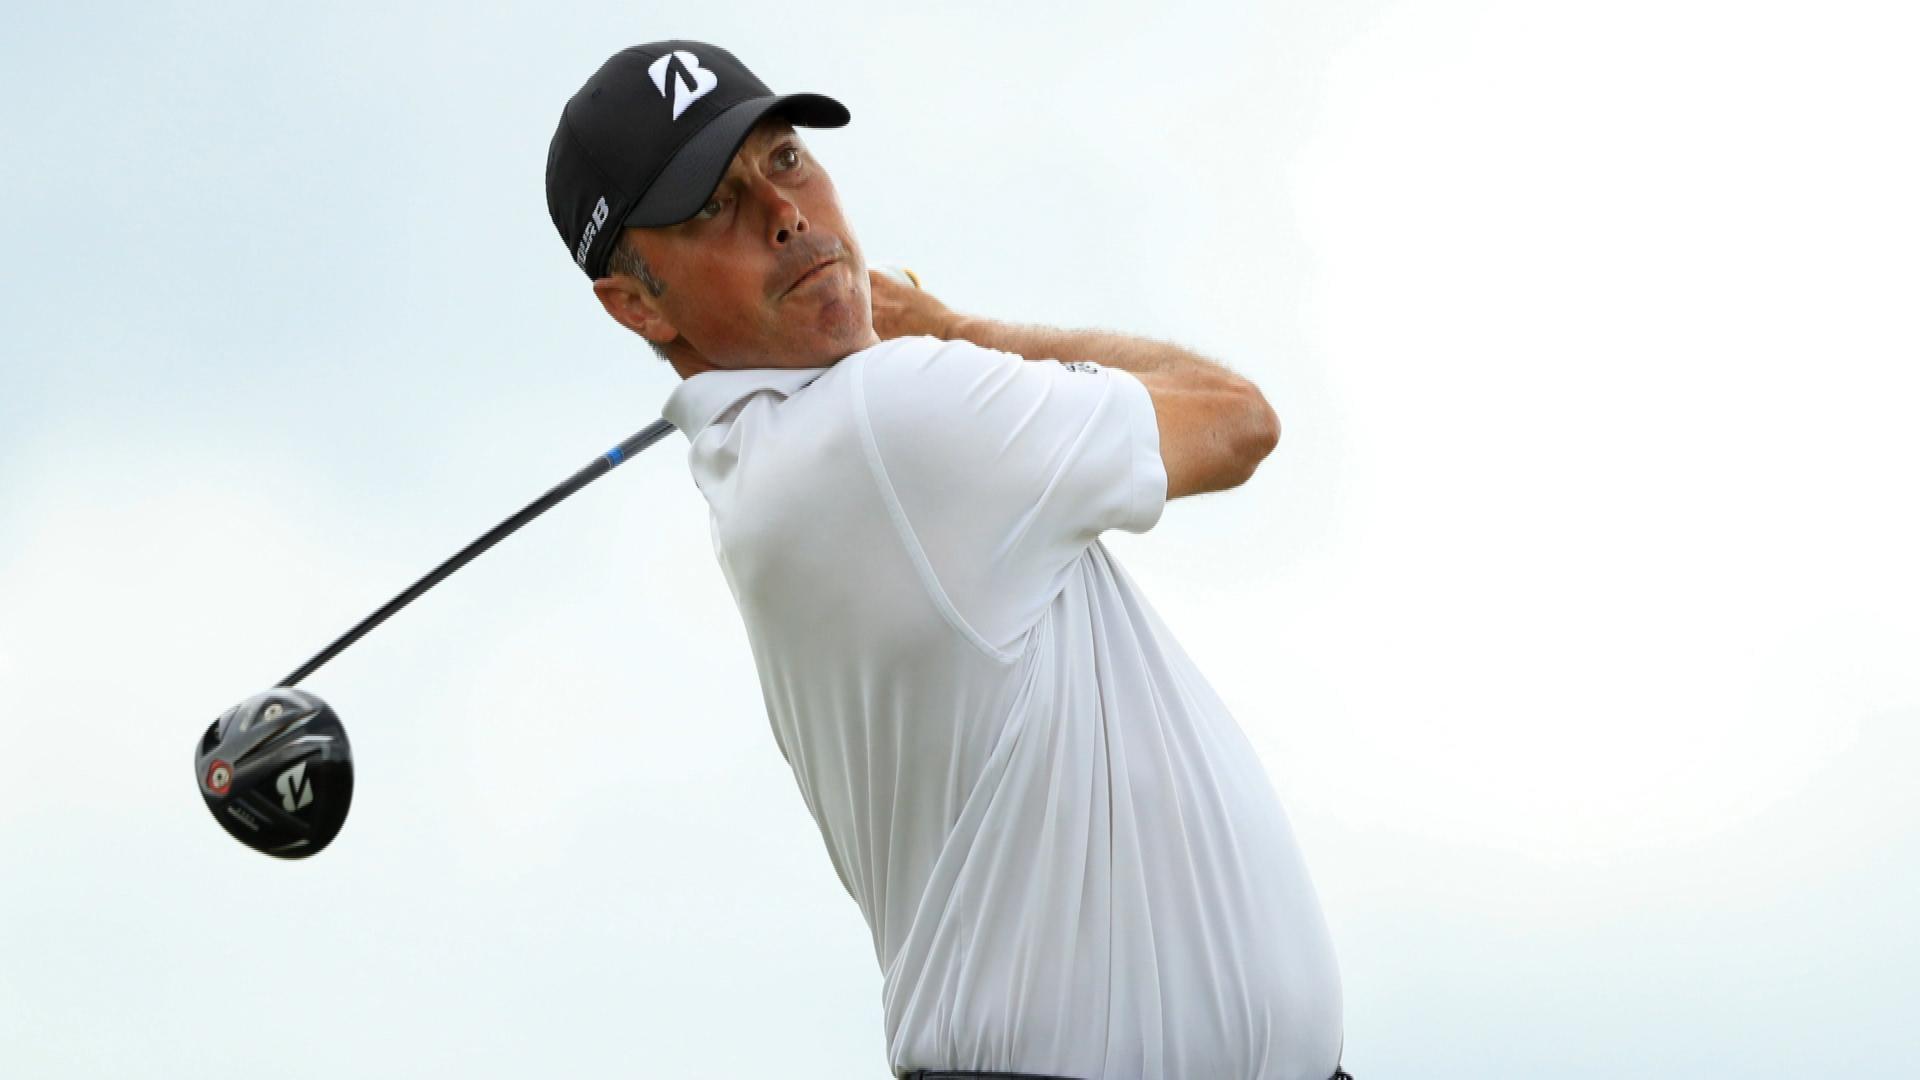 2017 Pga Championship Fantasy Picks Golf Channel